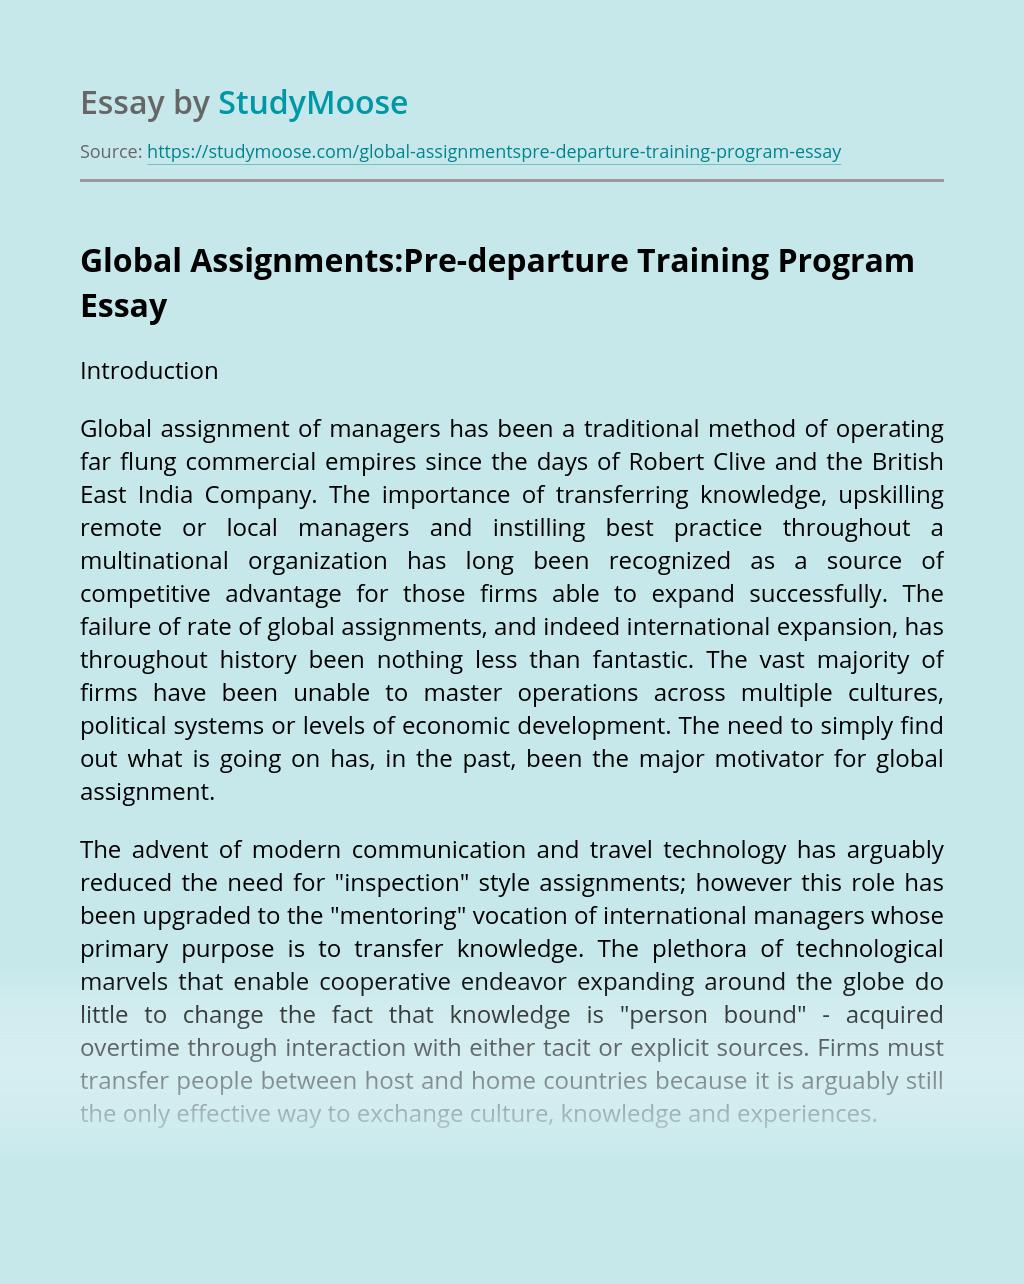 Global Assignments:Pre-departure Training Program